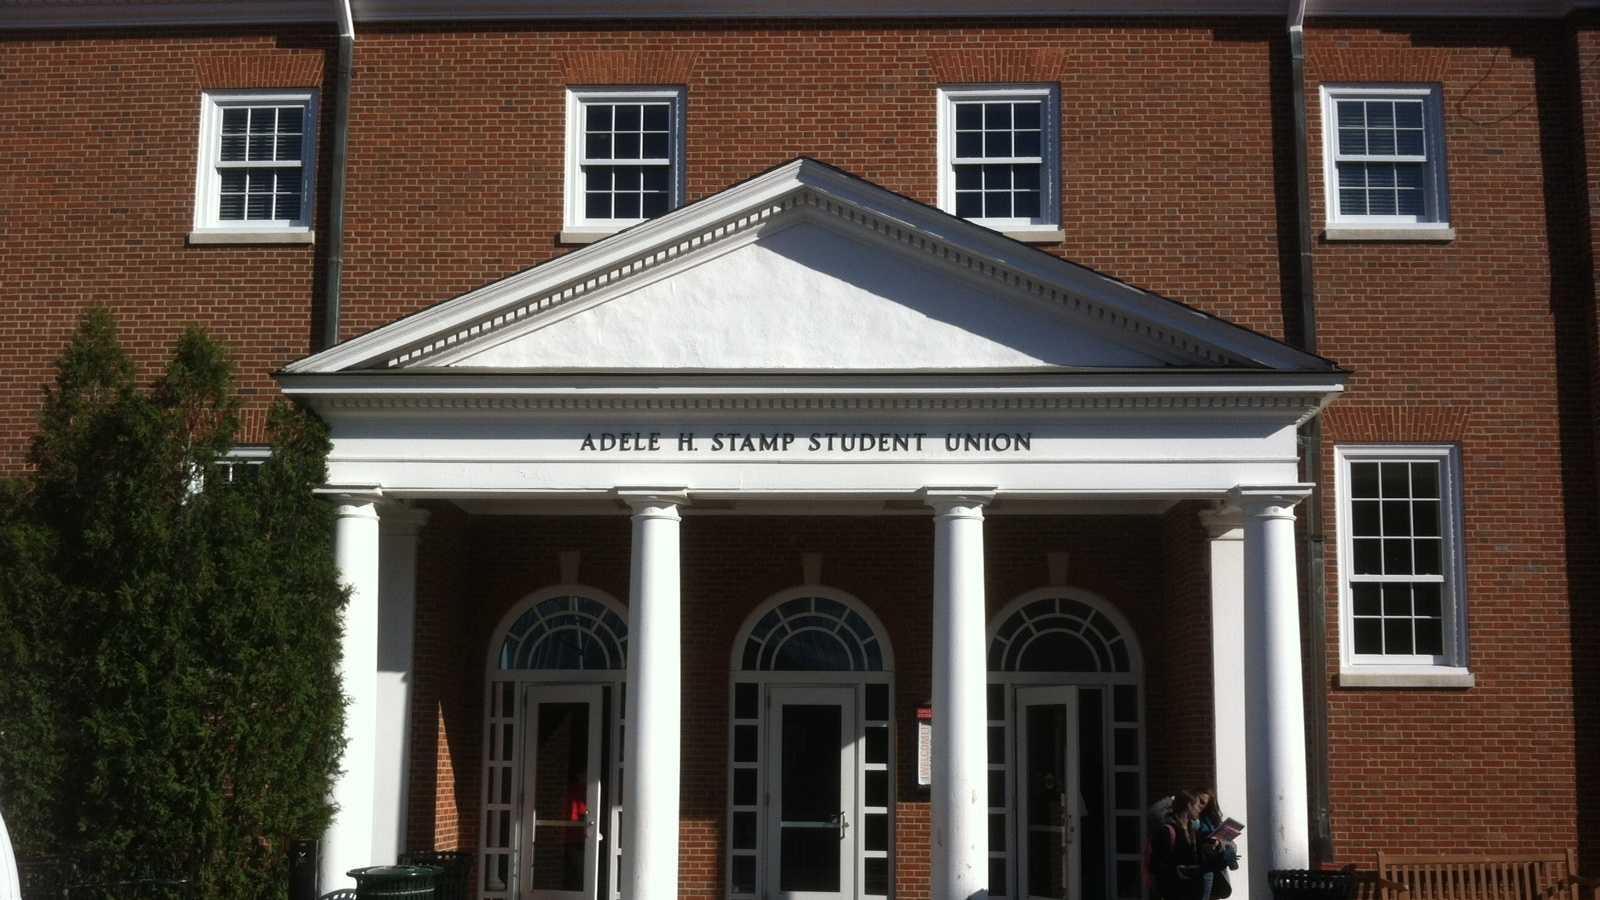 University of Maryland Stamp Student Union